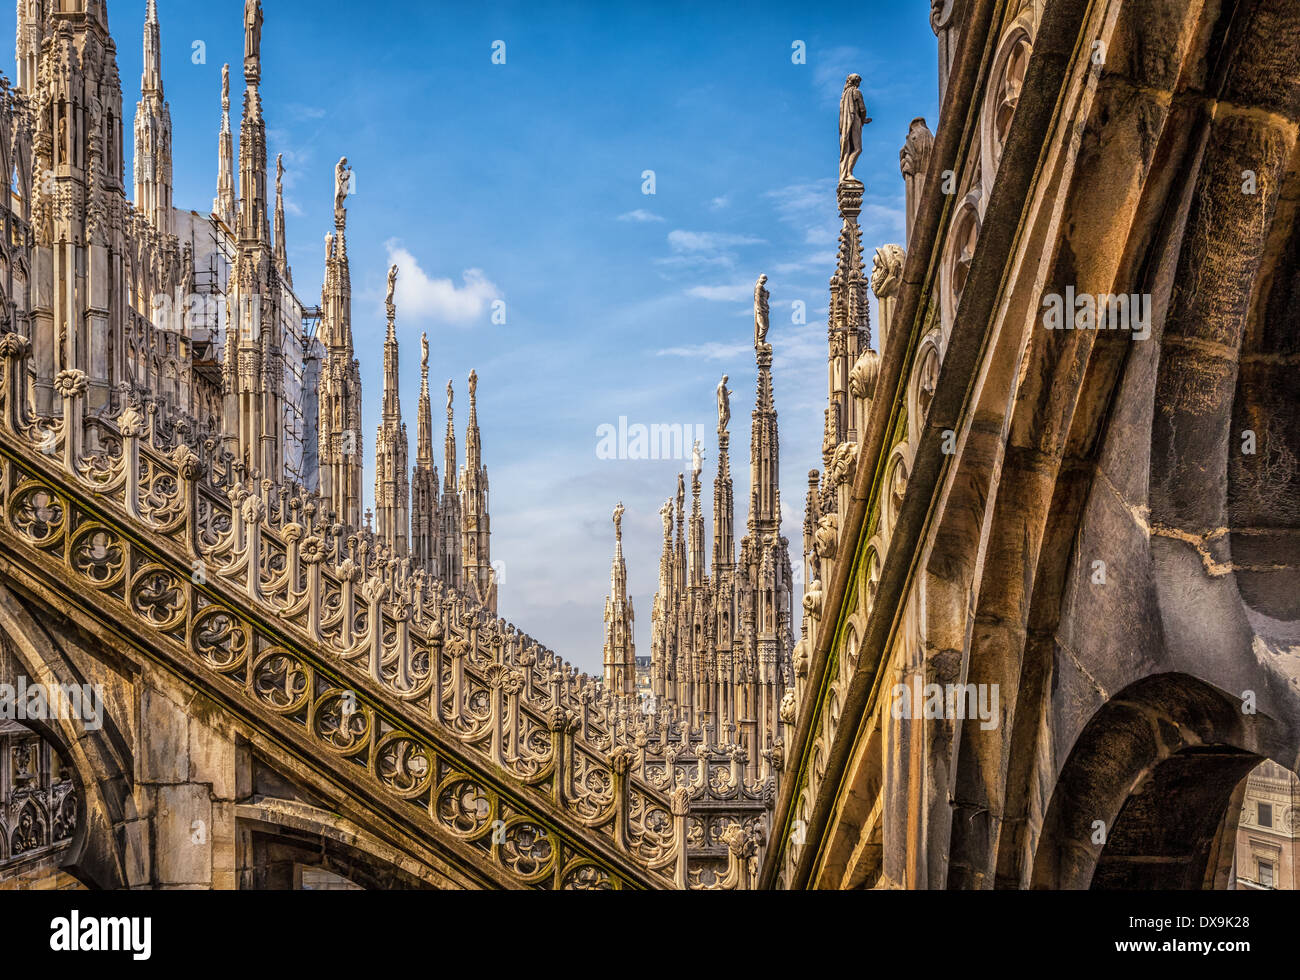 La cathédrale Duomo, Milan, Milan, Italie Photo Stock